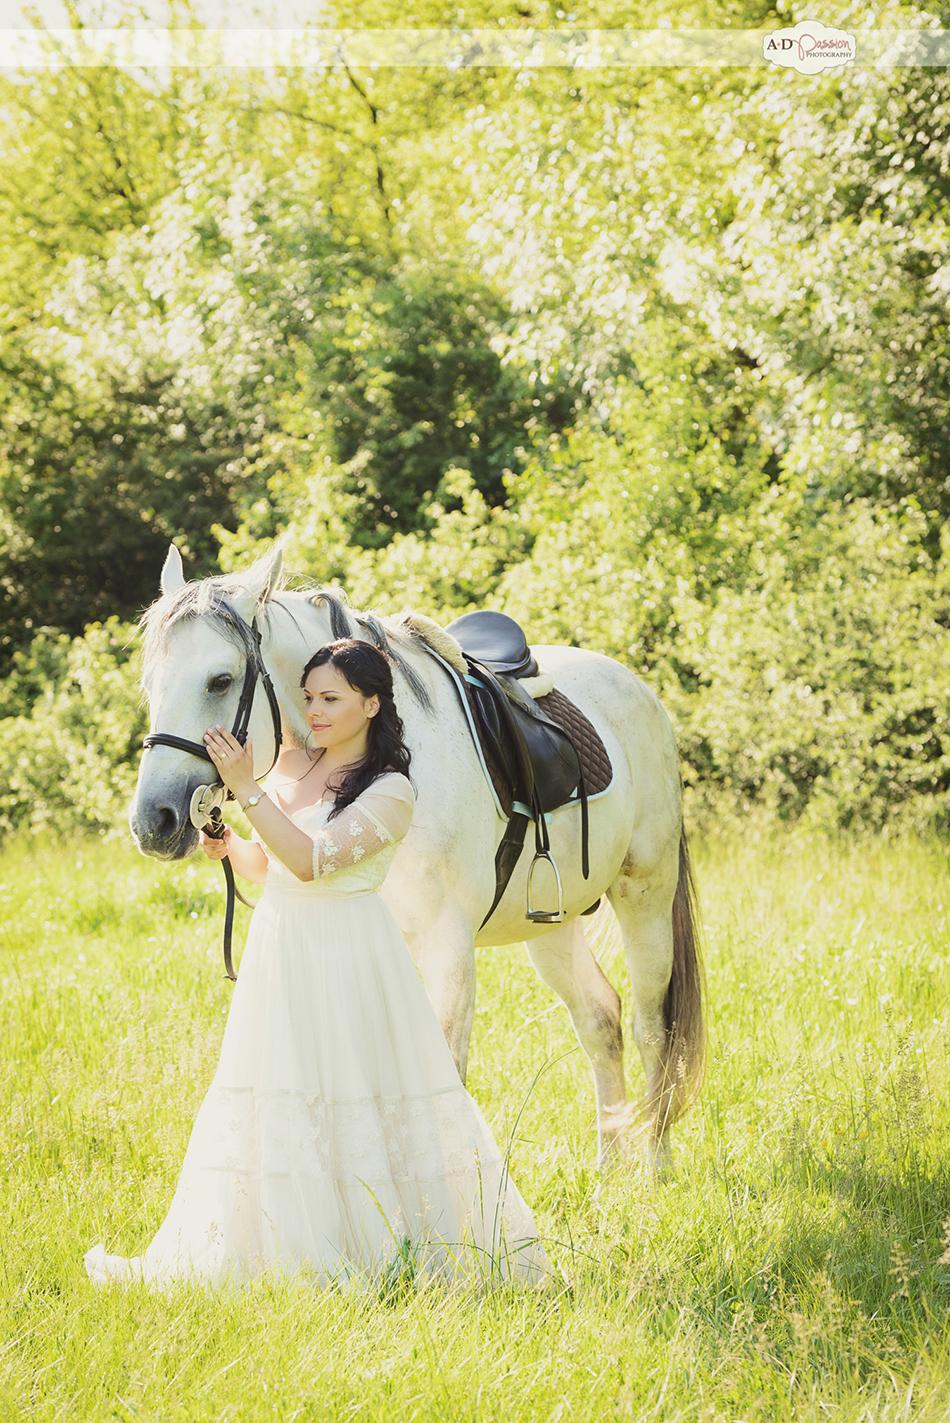 AD Passion Photography | cristina-emanuel-ttd_0004 | Adelin, Dida, fotograf profesionist, fotograf de nunta, fotografie de nunta, fotograf Timisoara, fotograf Craiova, fotograf Bucuresti, fotograf Arad, nunta Timisoara, nunta Arad, nunta Bucuresti, nunta Craiova